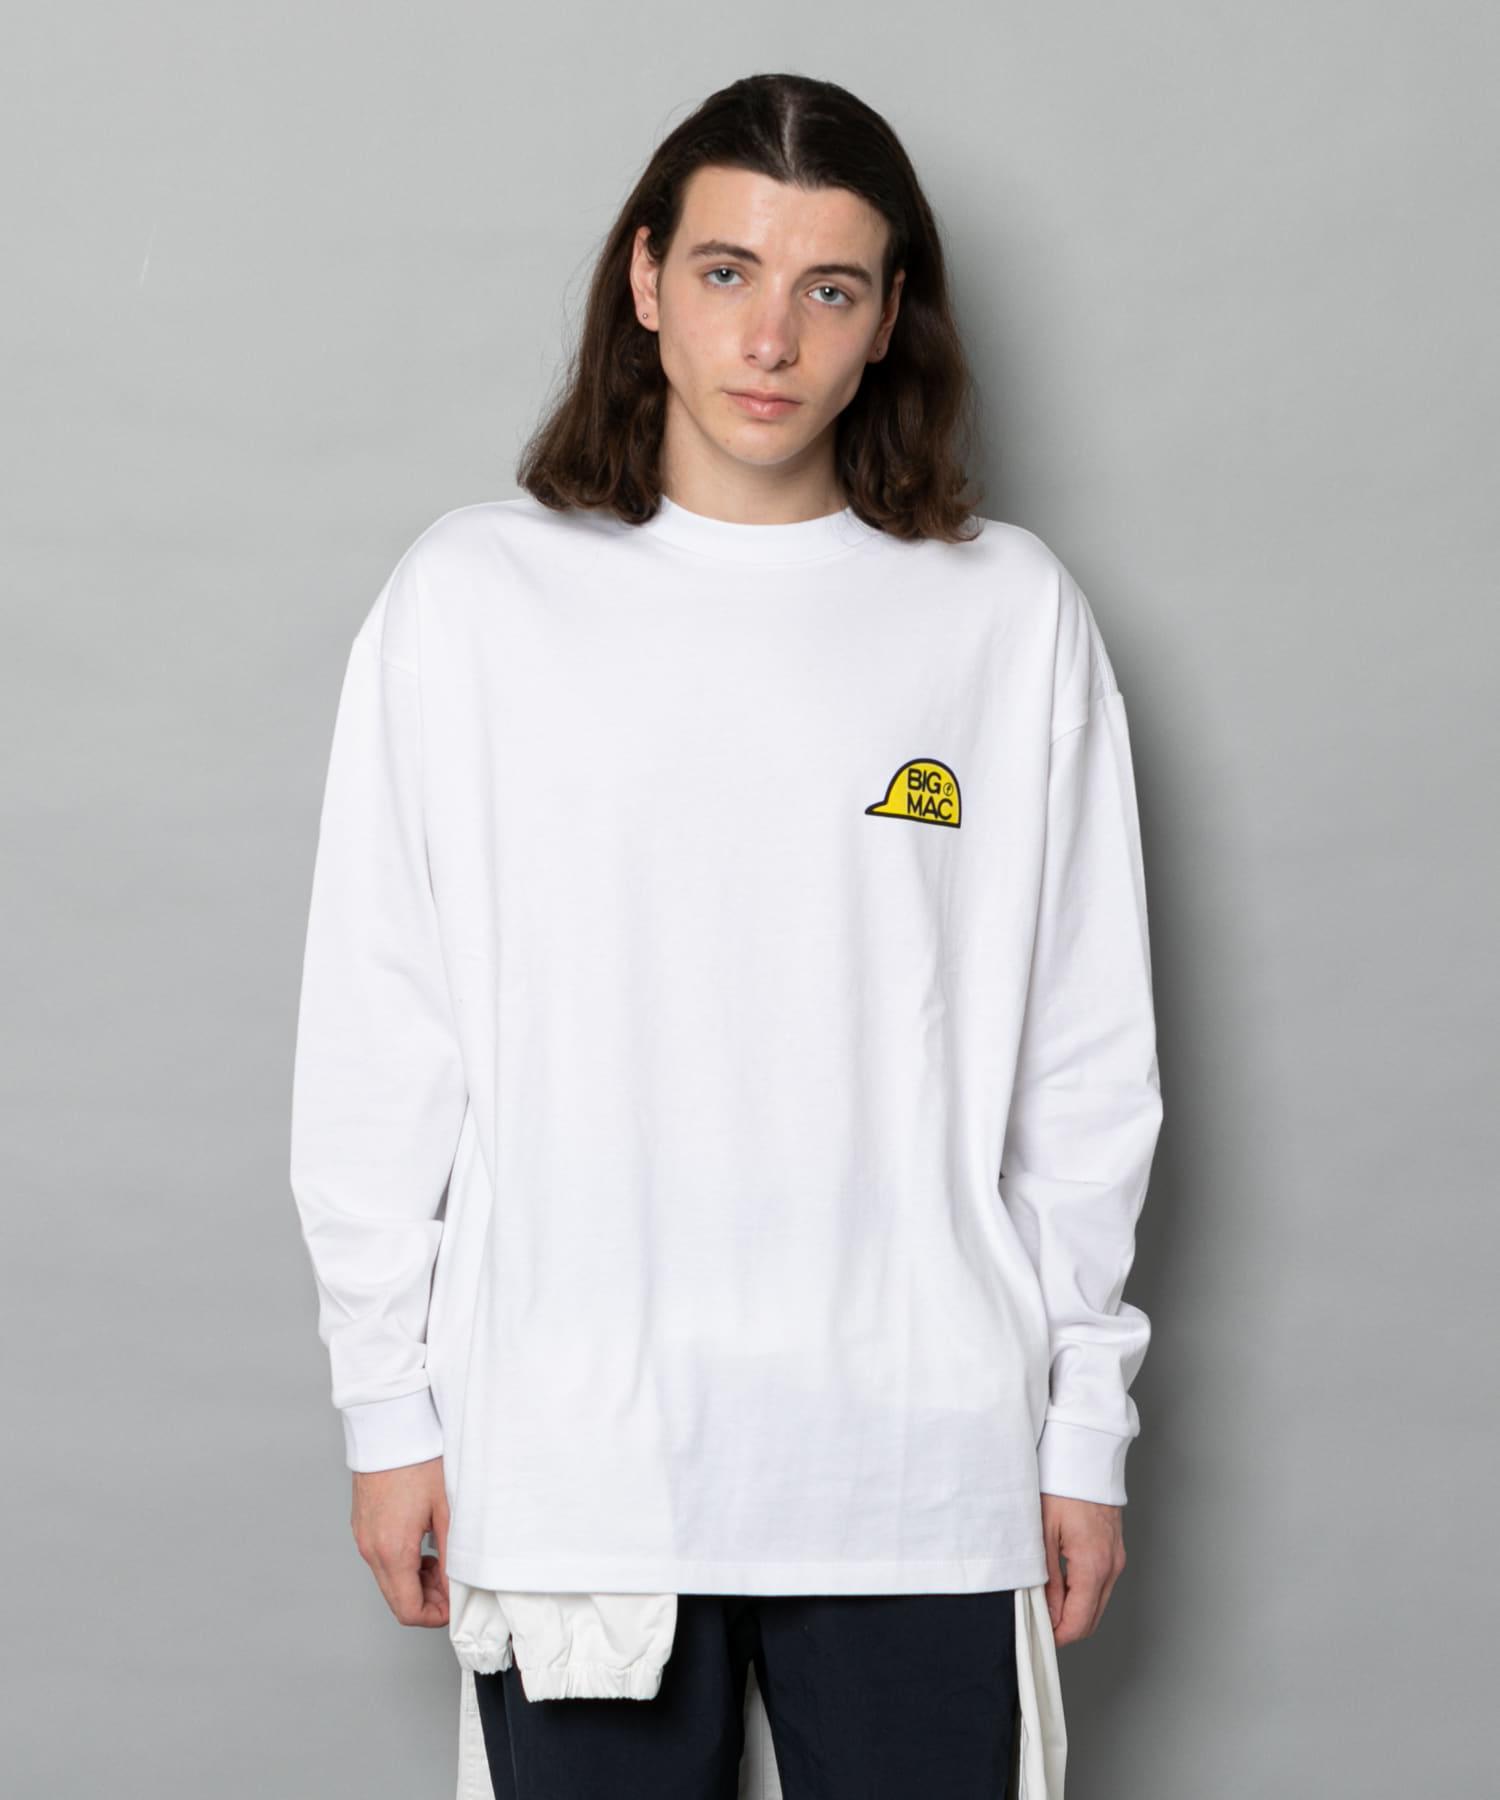 OUTLET(アウトレット) メンズ 【Ciaopanic】【BIG MAC×FACE】CAPプリントTシャツ/ロンT ホワイト